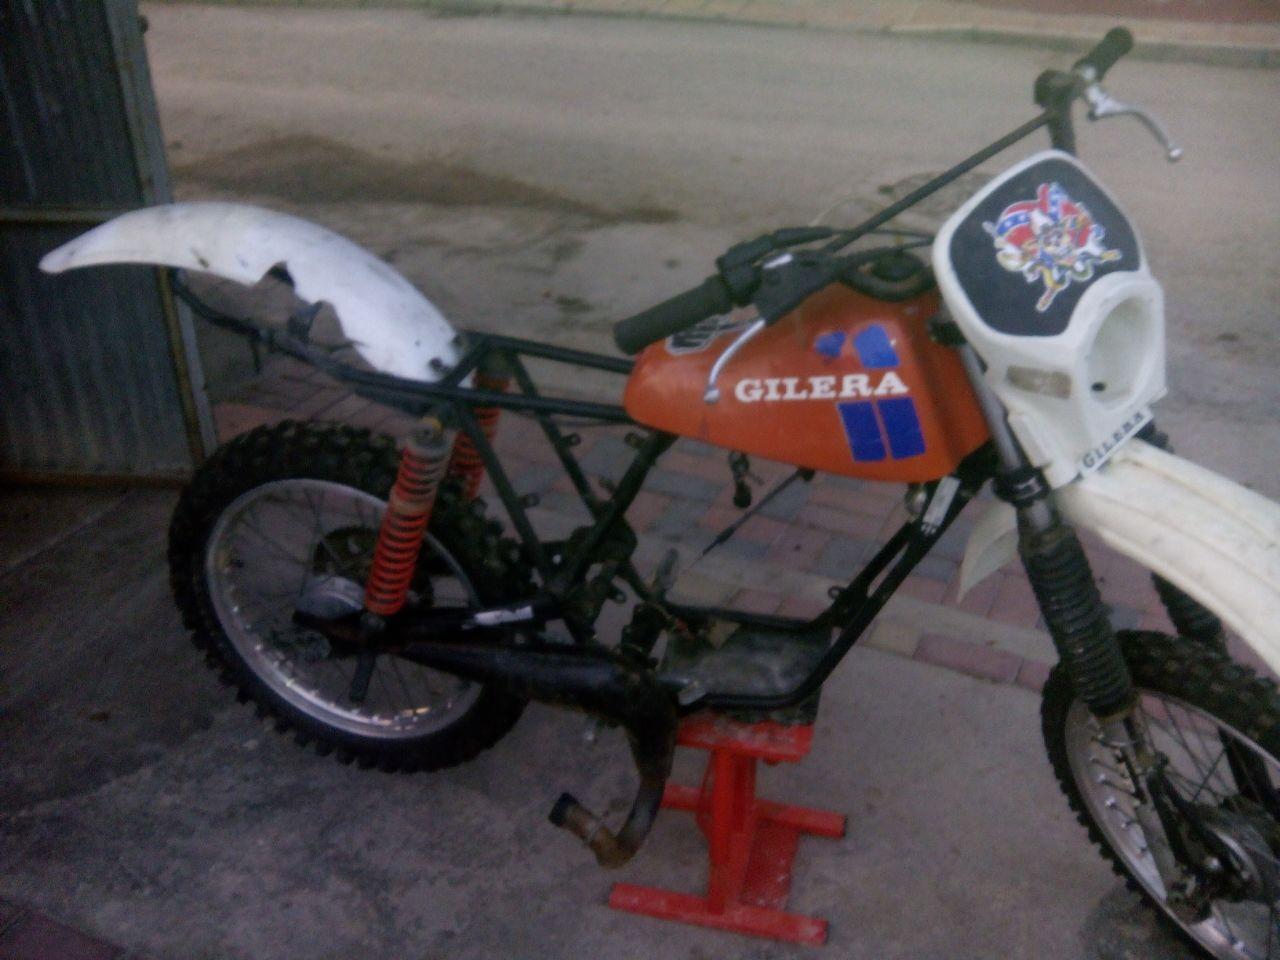 gilera - Identificar motor Gilera Vmx3k7